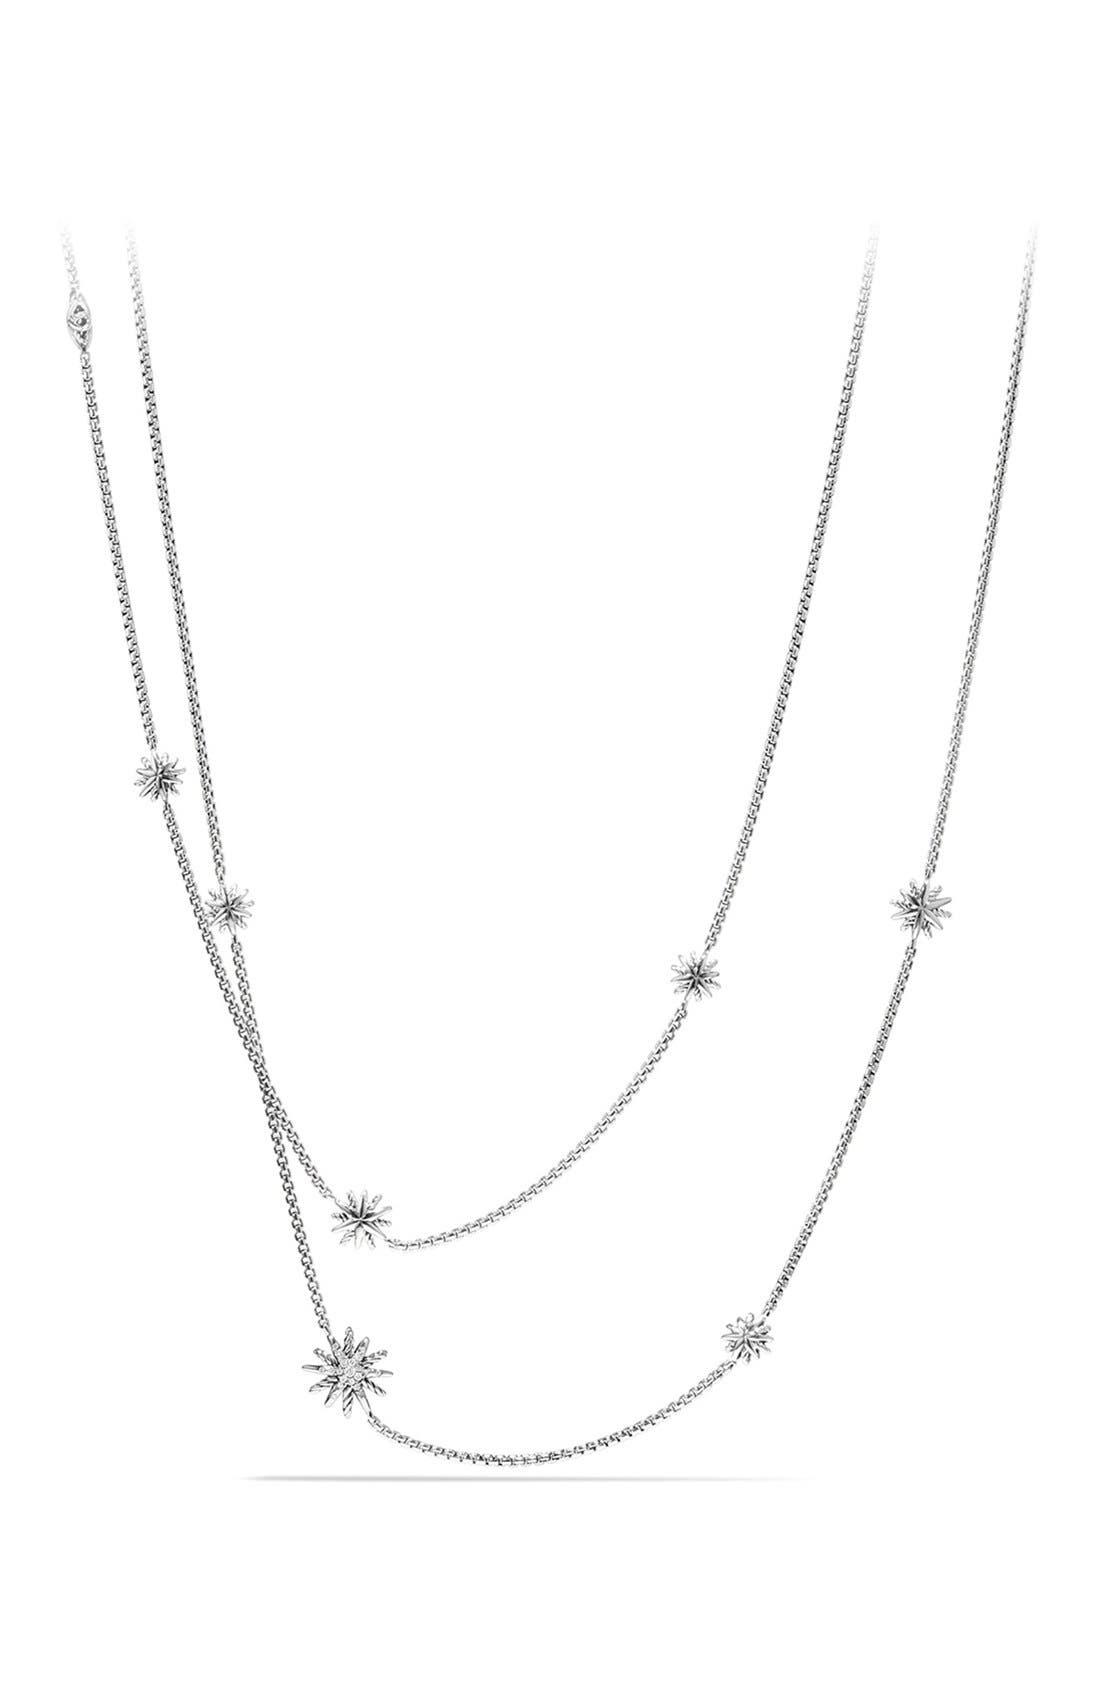 David Yurman'Starburst' Station Necklace with Diamonds